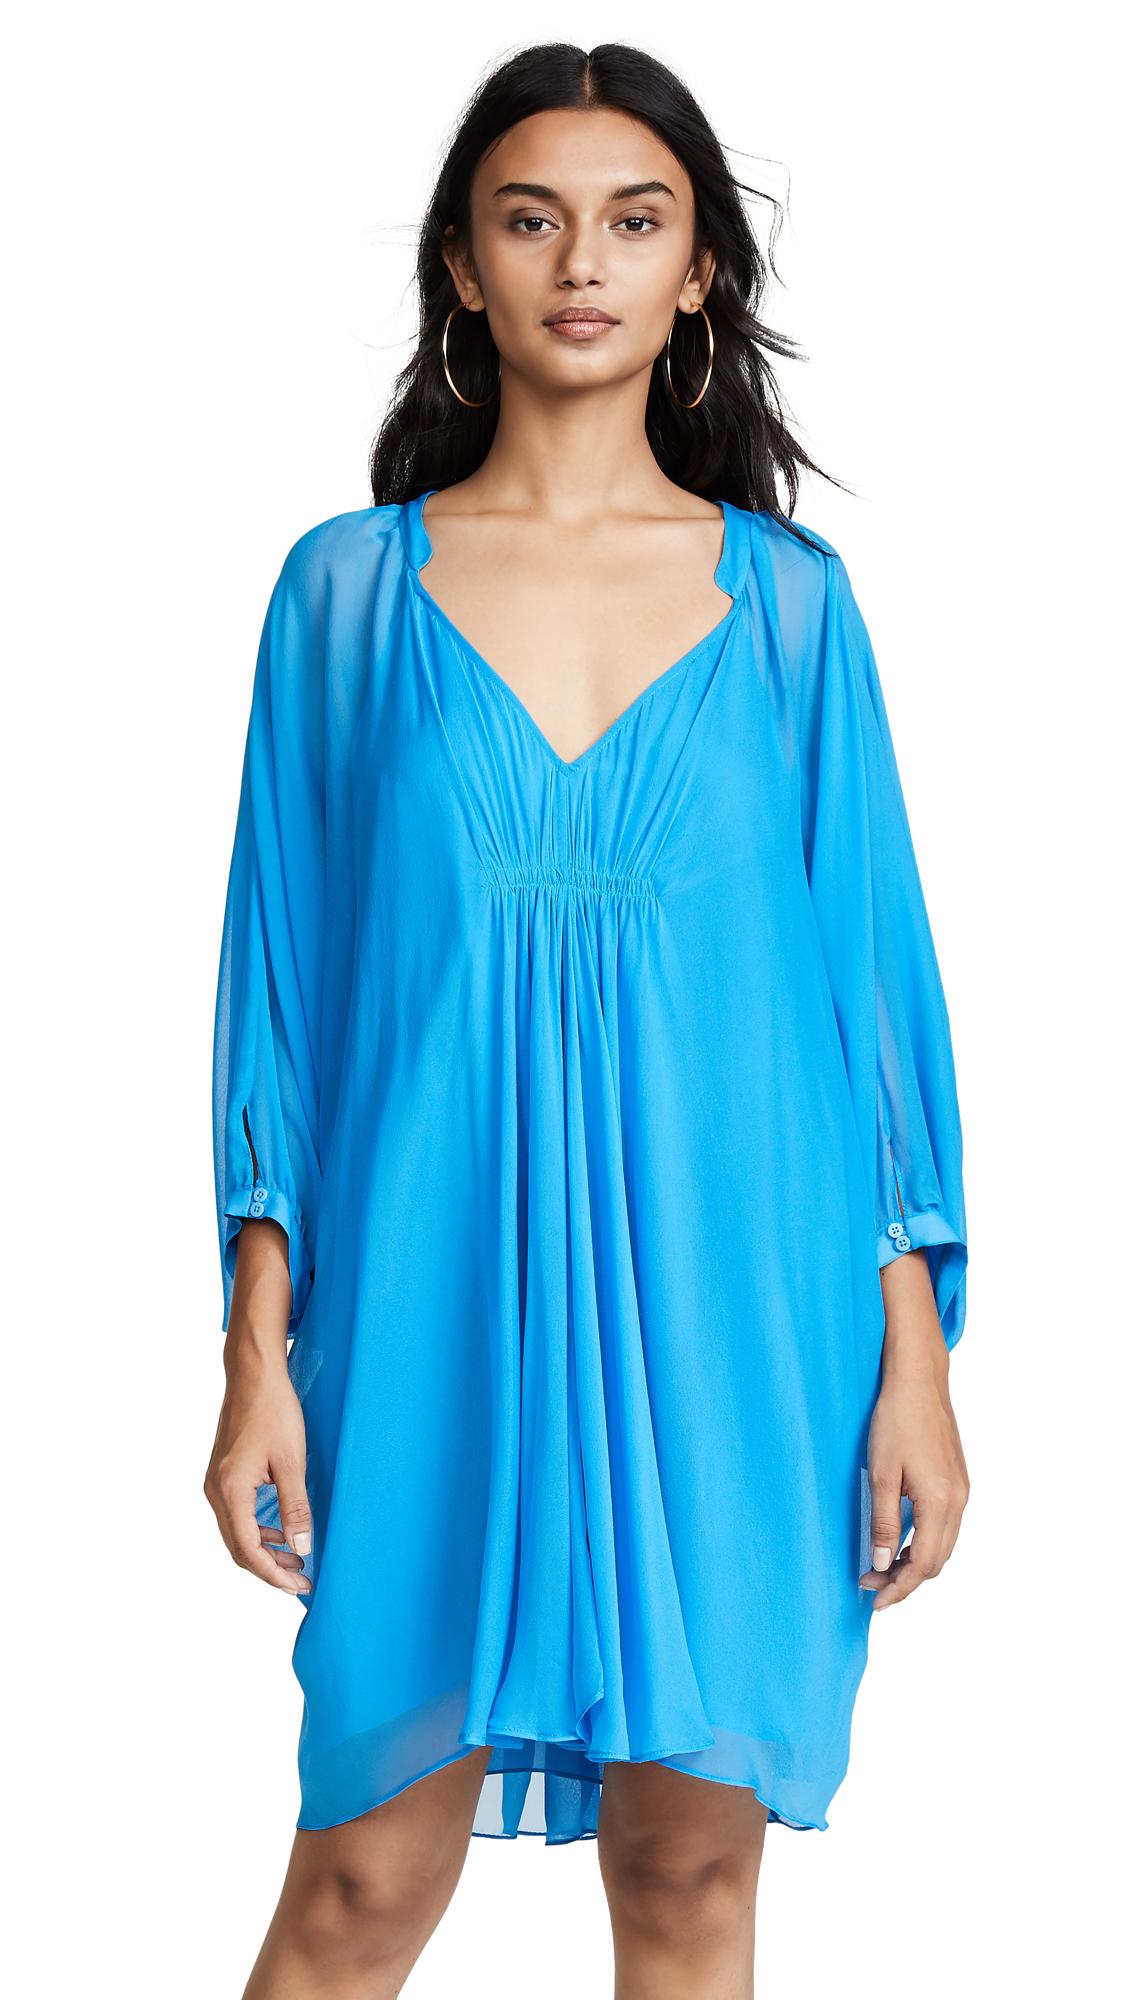 ae5d9f6c87c41 Diane Von Furstenberg Fleurette Cover Up Dress In Patio Blue | ModeSens